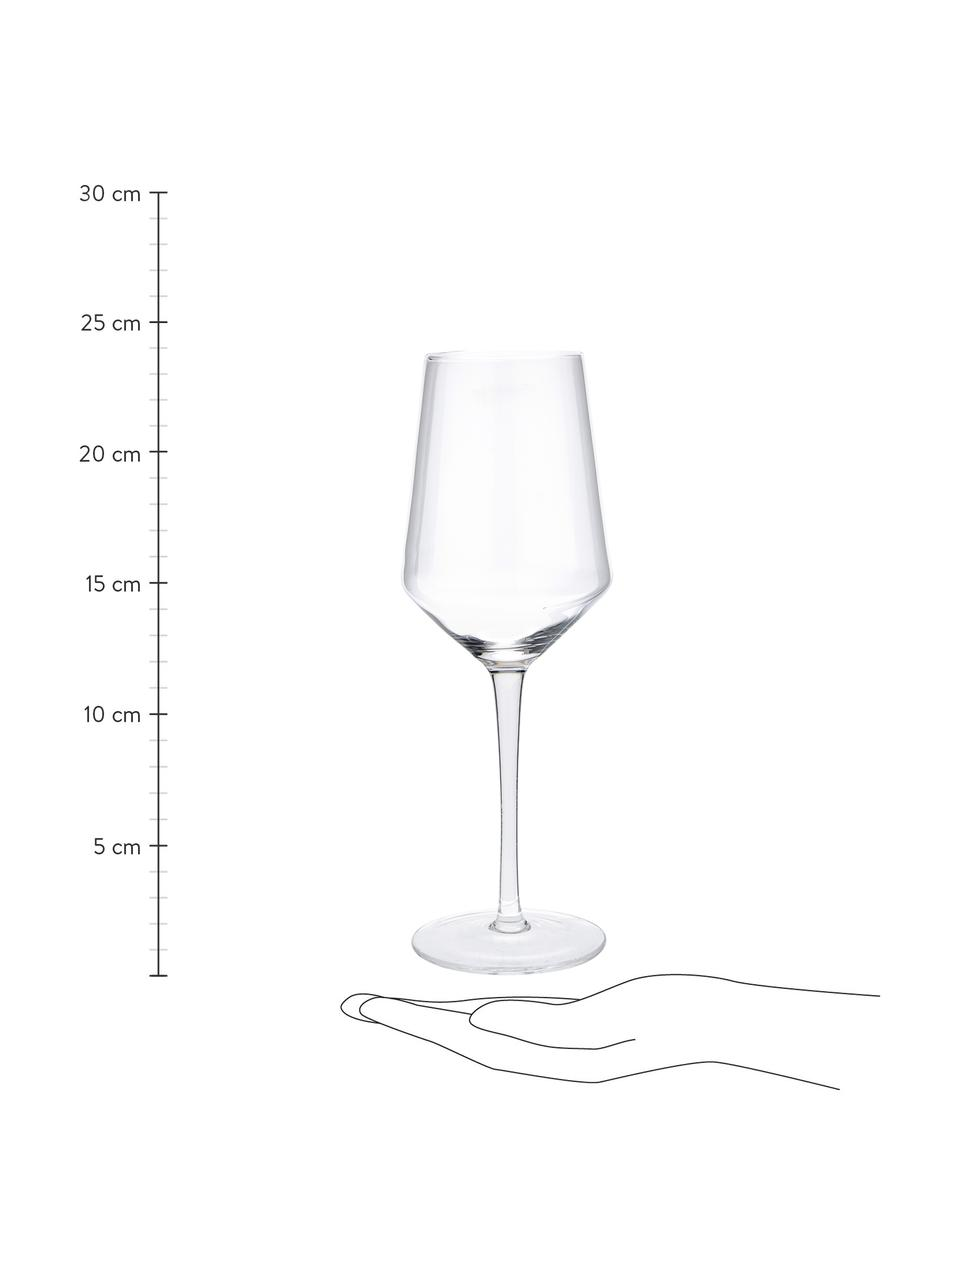 Bicchiere vino bianco in vetro soffiato Ays 4 pz, Vetro, Trasparente, Ø 6 x Alt. 24 cm